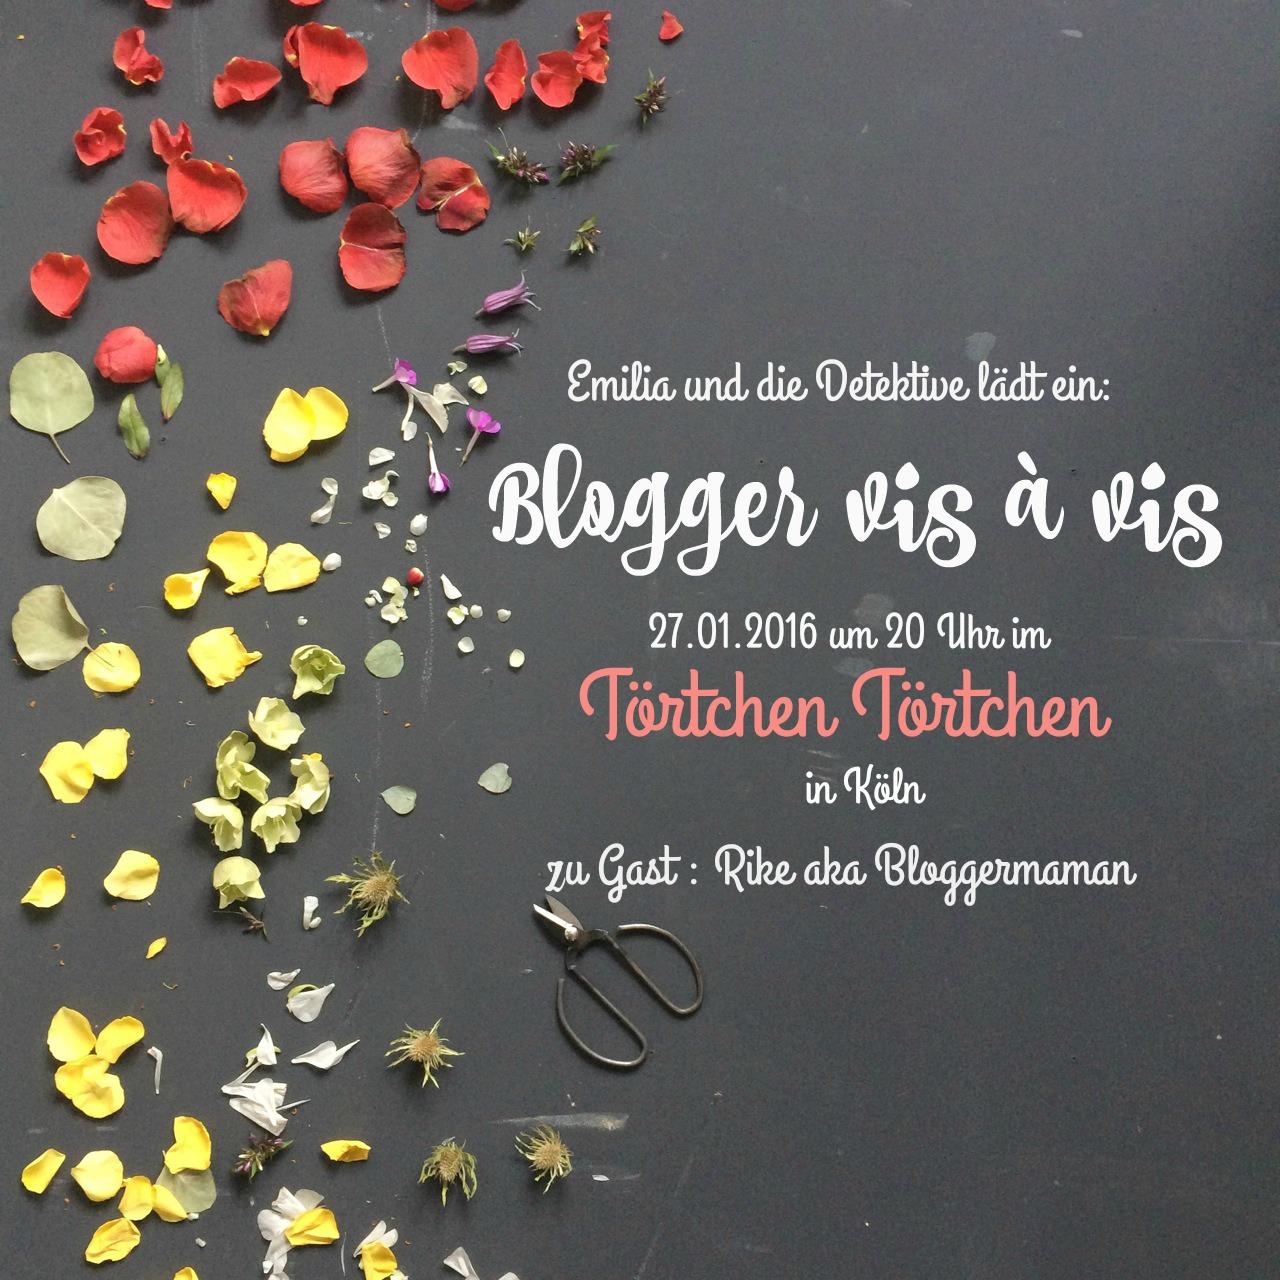 Blogger Vis à Vis im Törtchen Törtchen in Köln